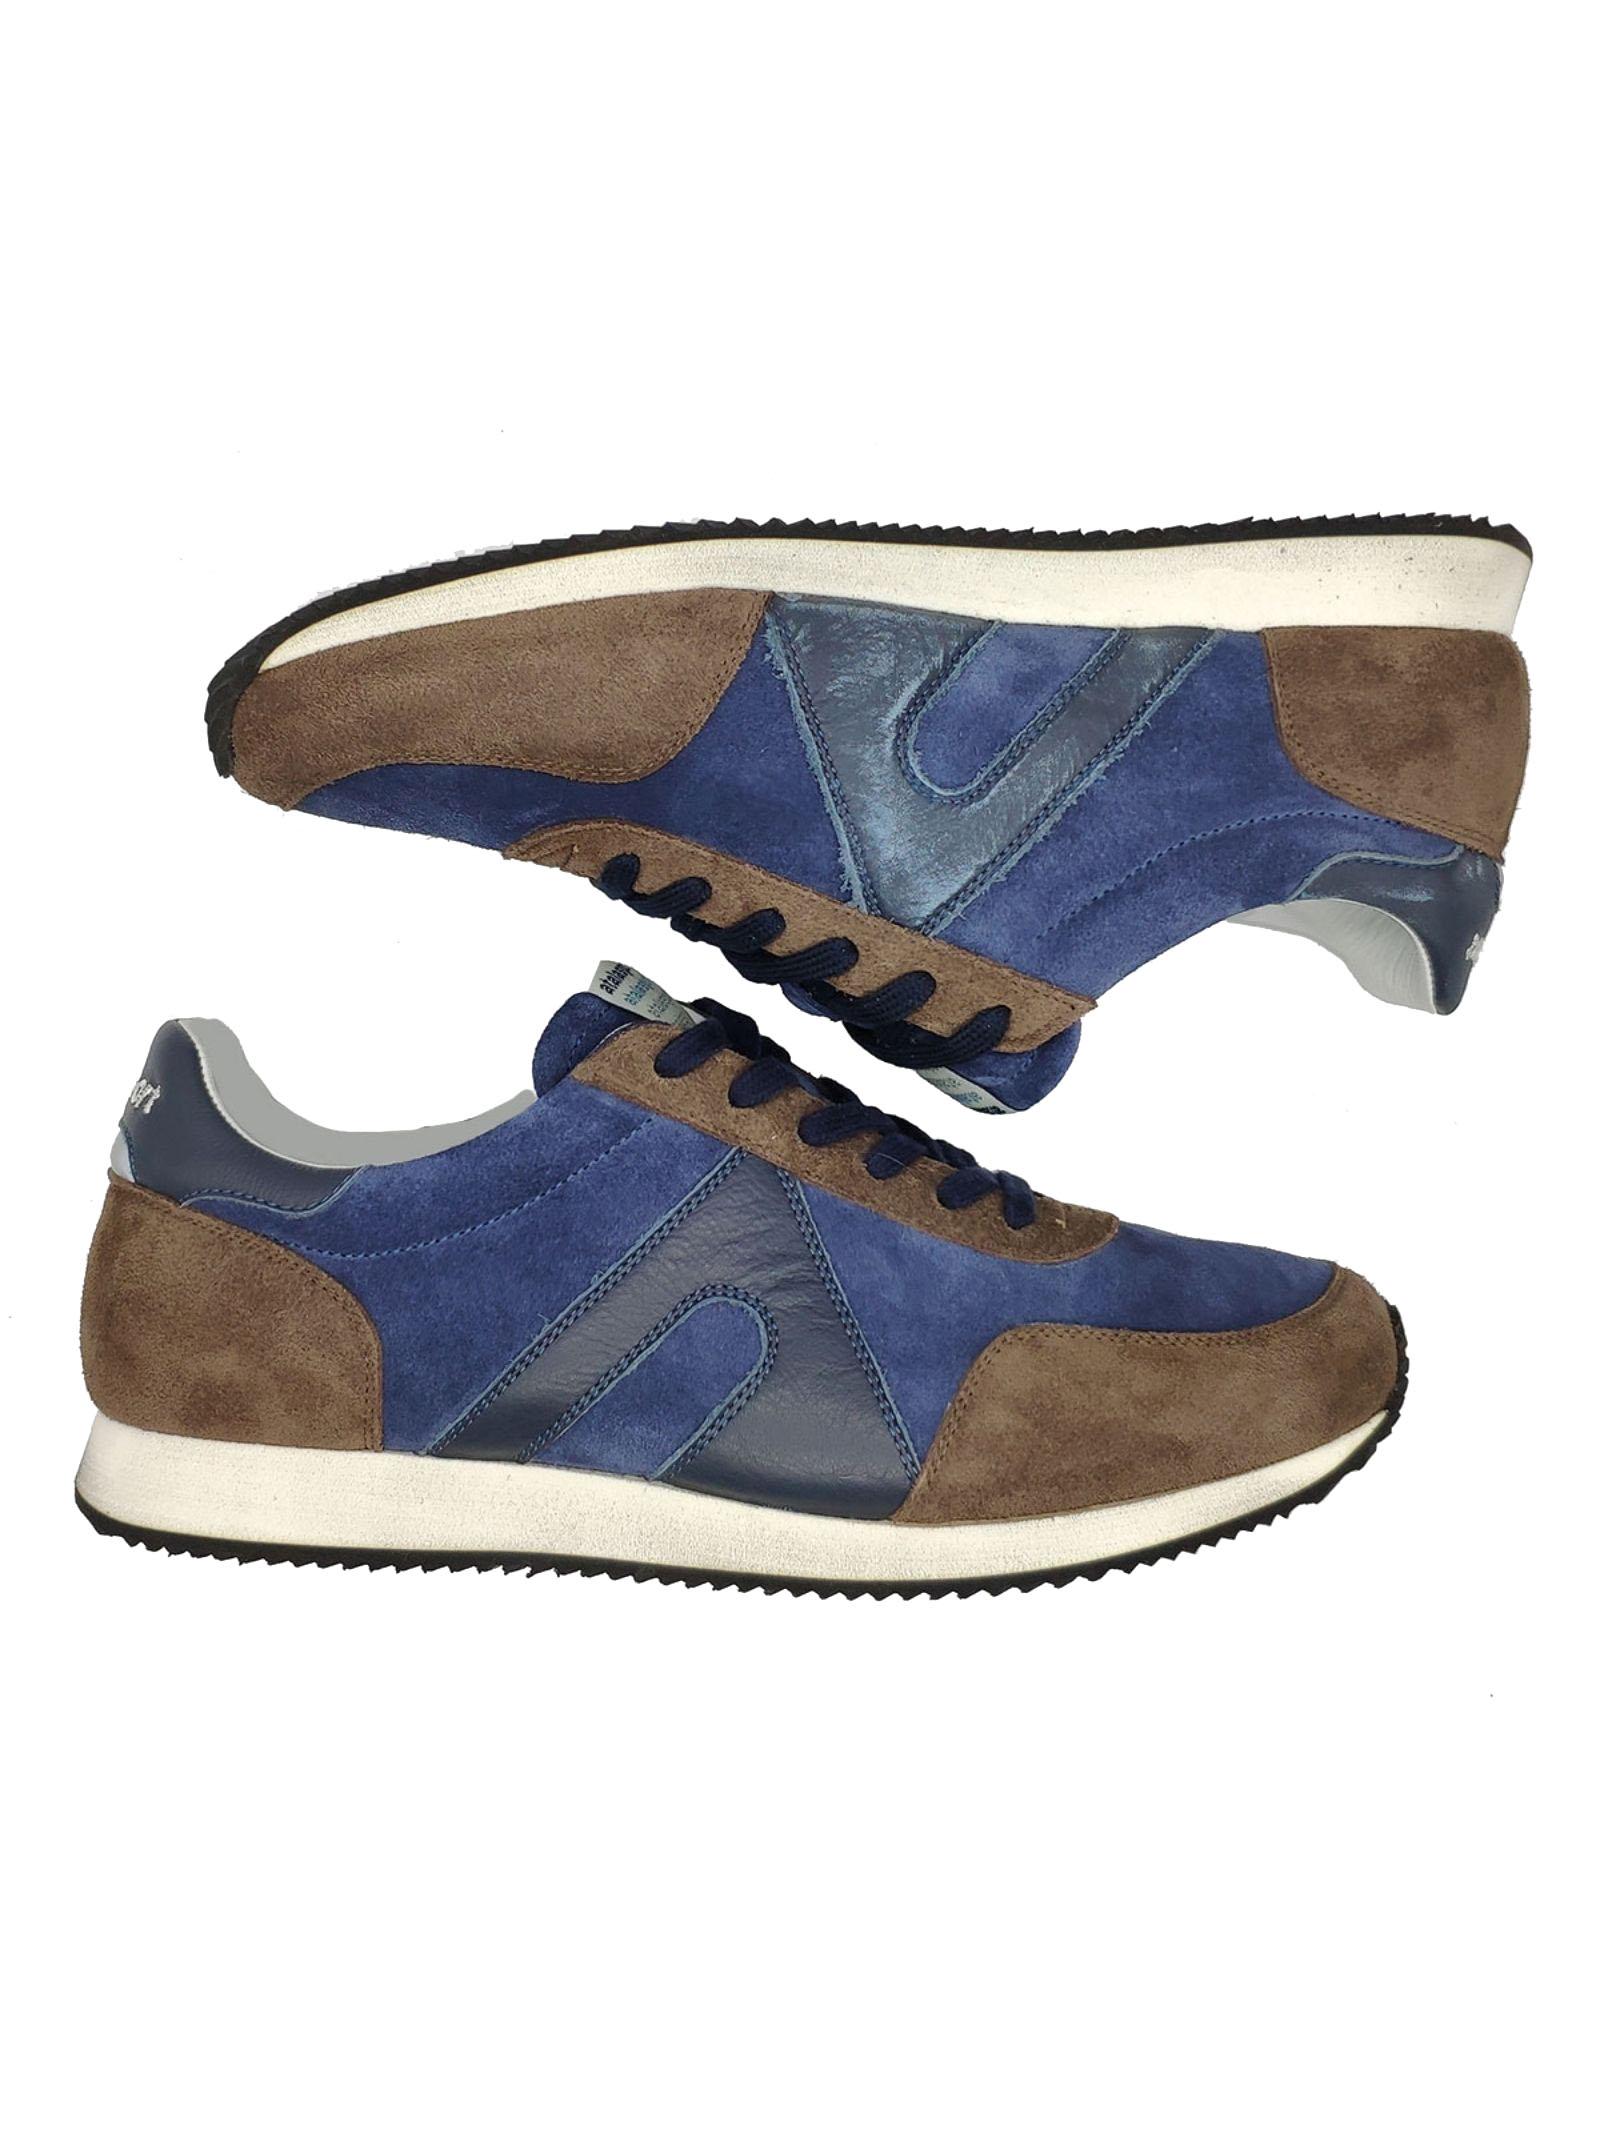 Men's Running Sneakers Atala | Sneakers | 10011MARRONE/BLU